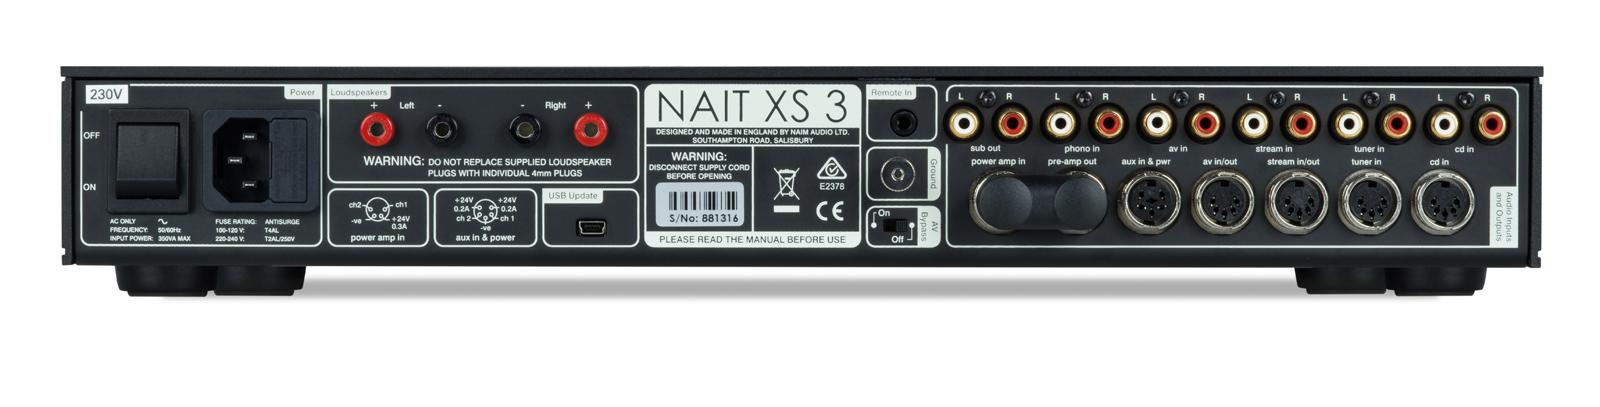 Nait XS 3 Connection Panel